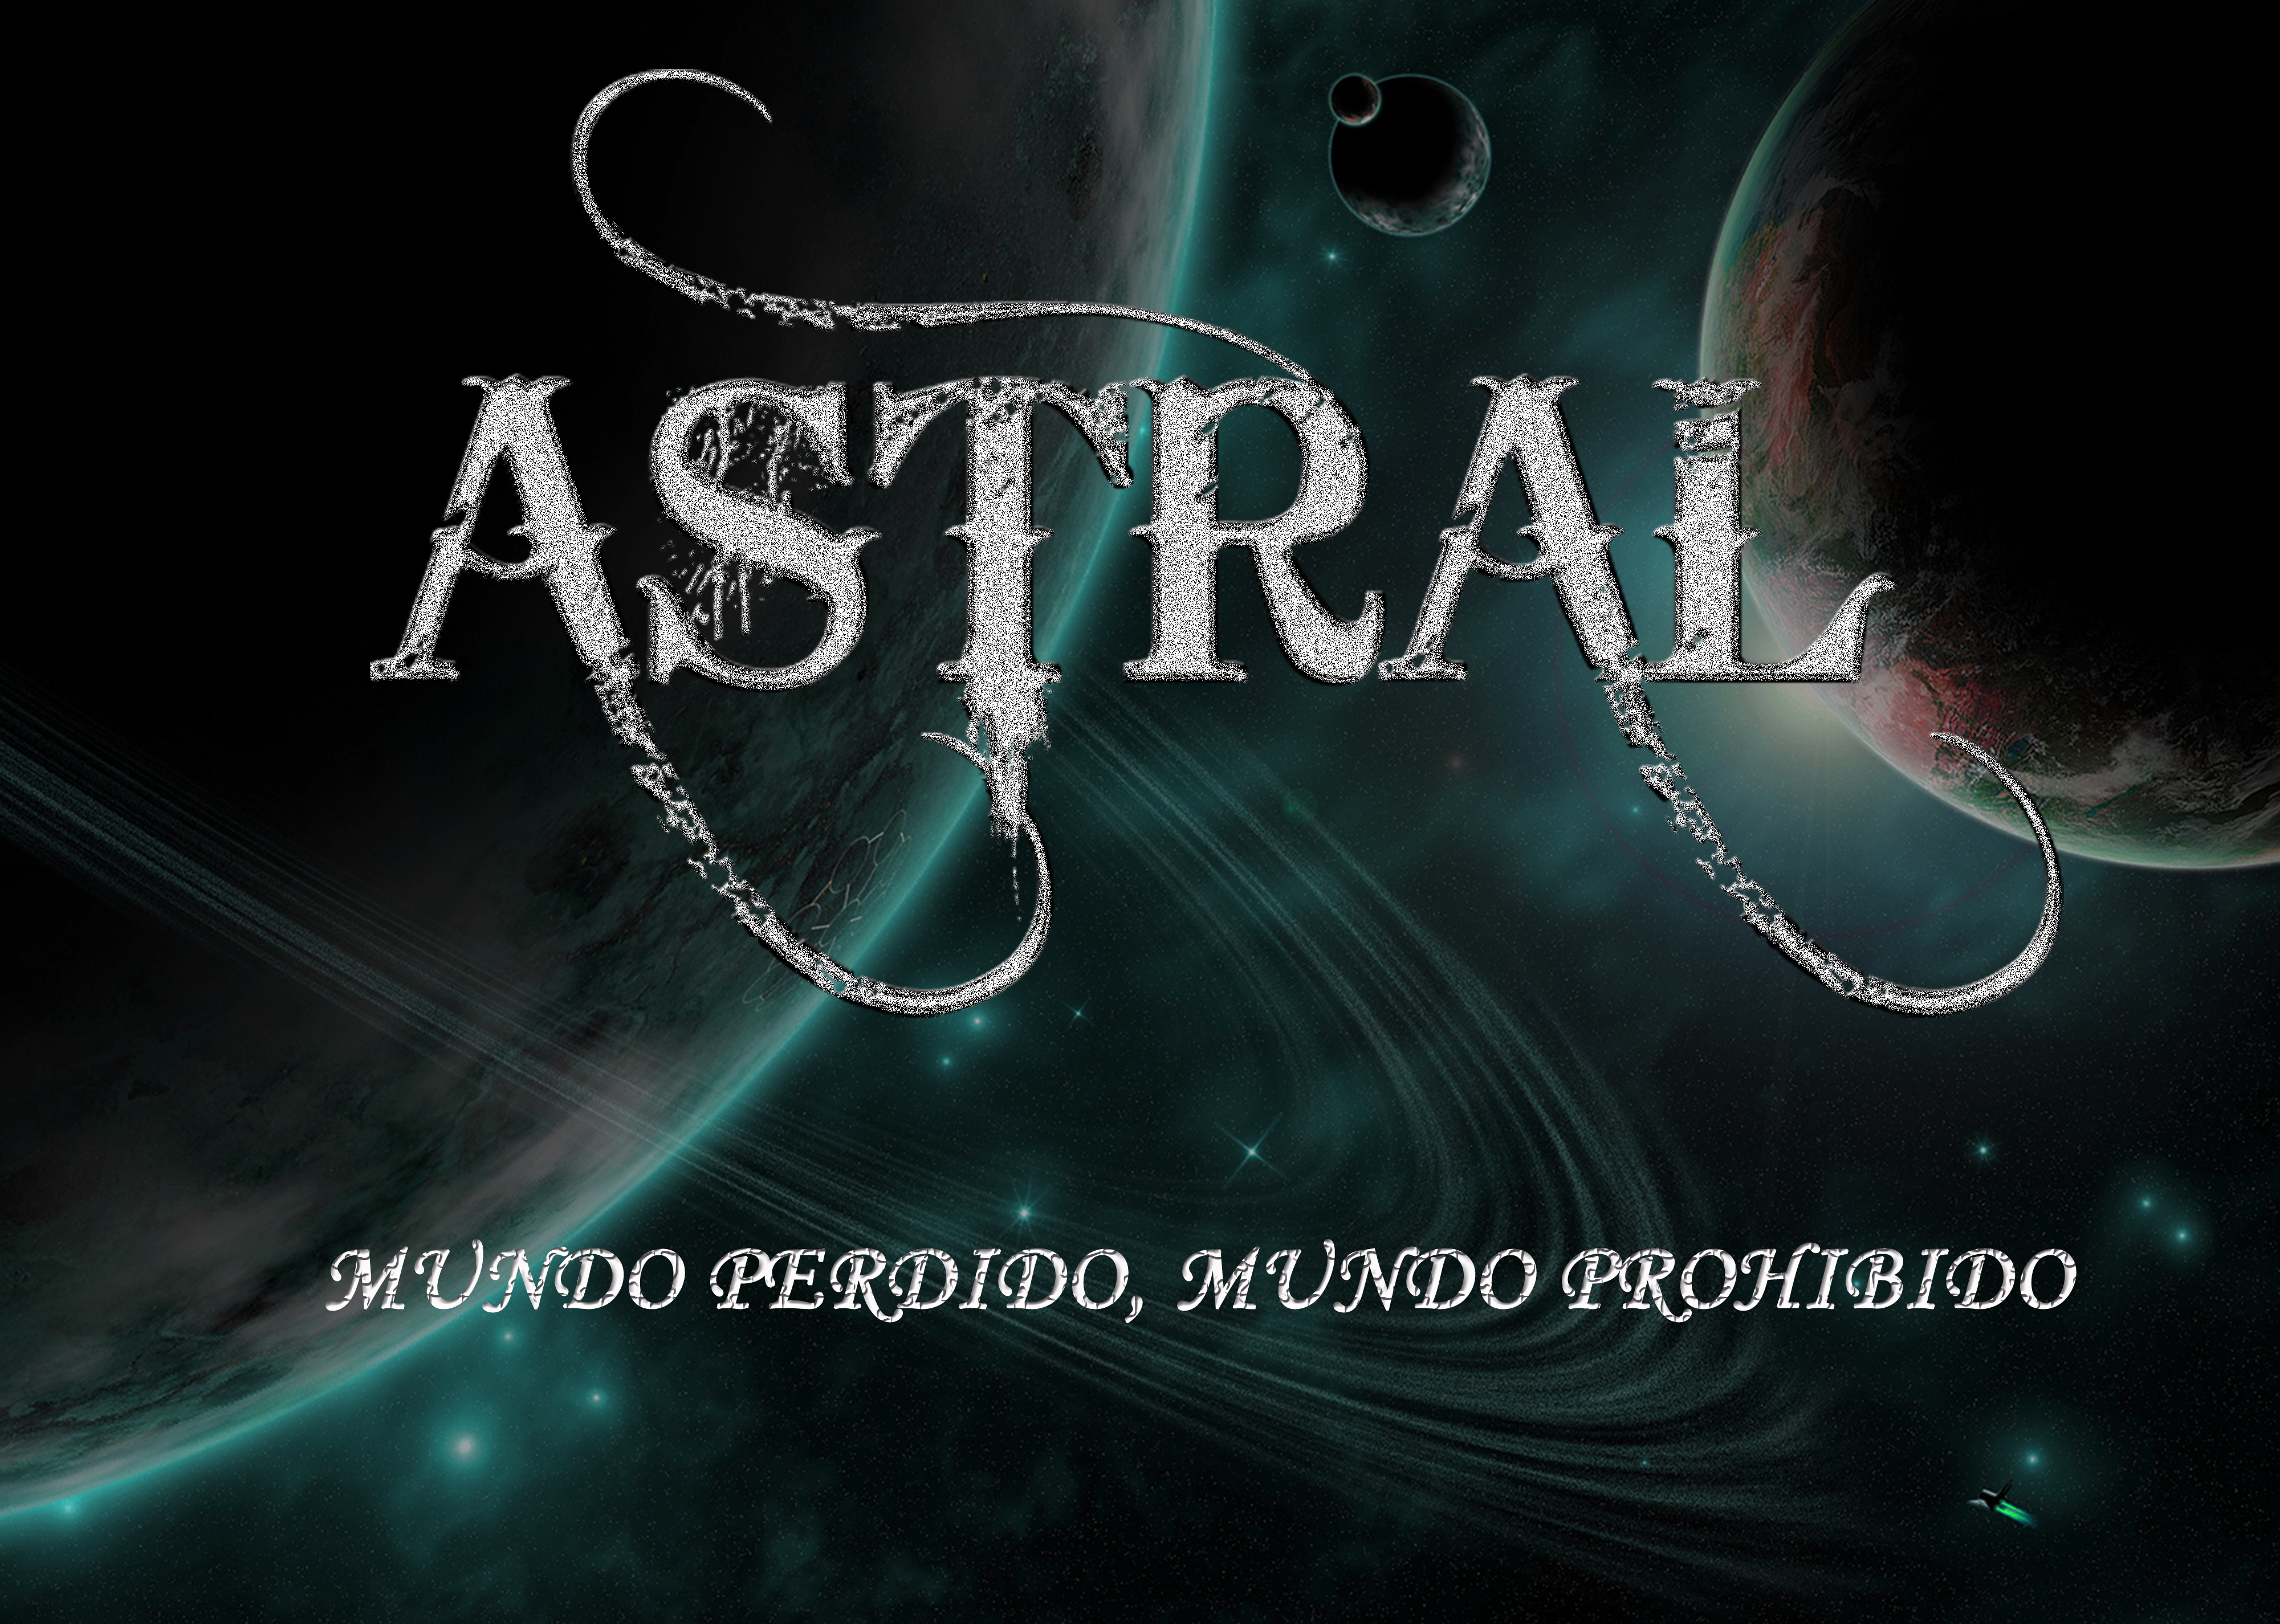 ASTRAL. PORTADA